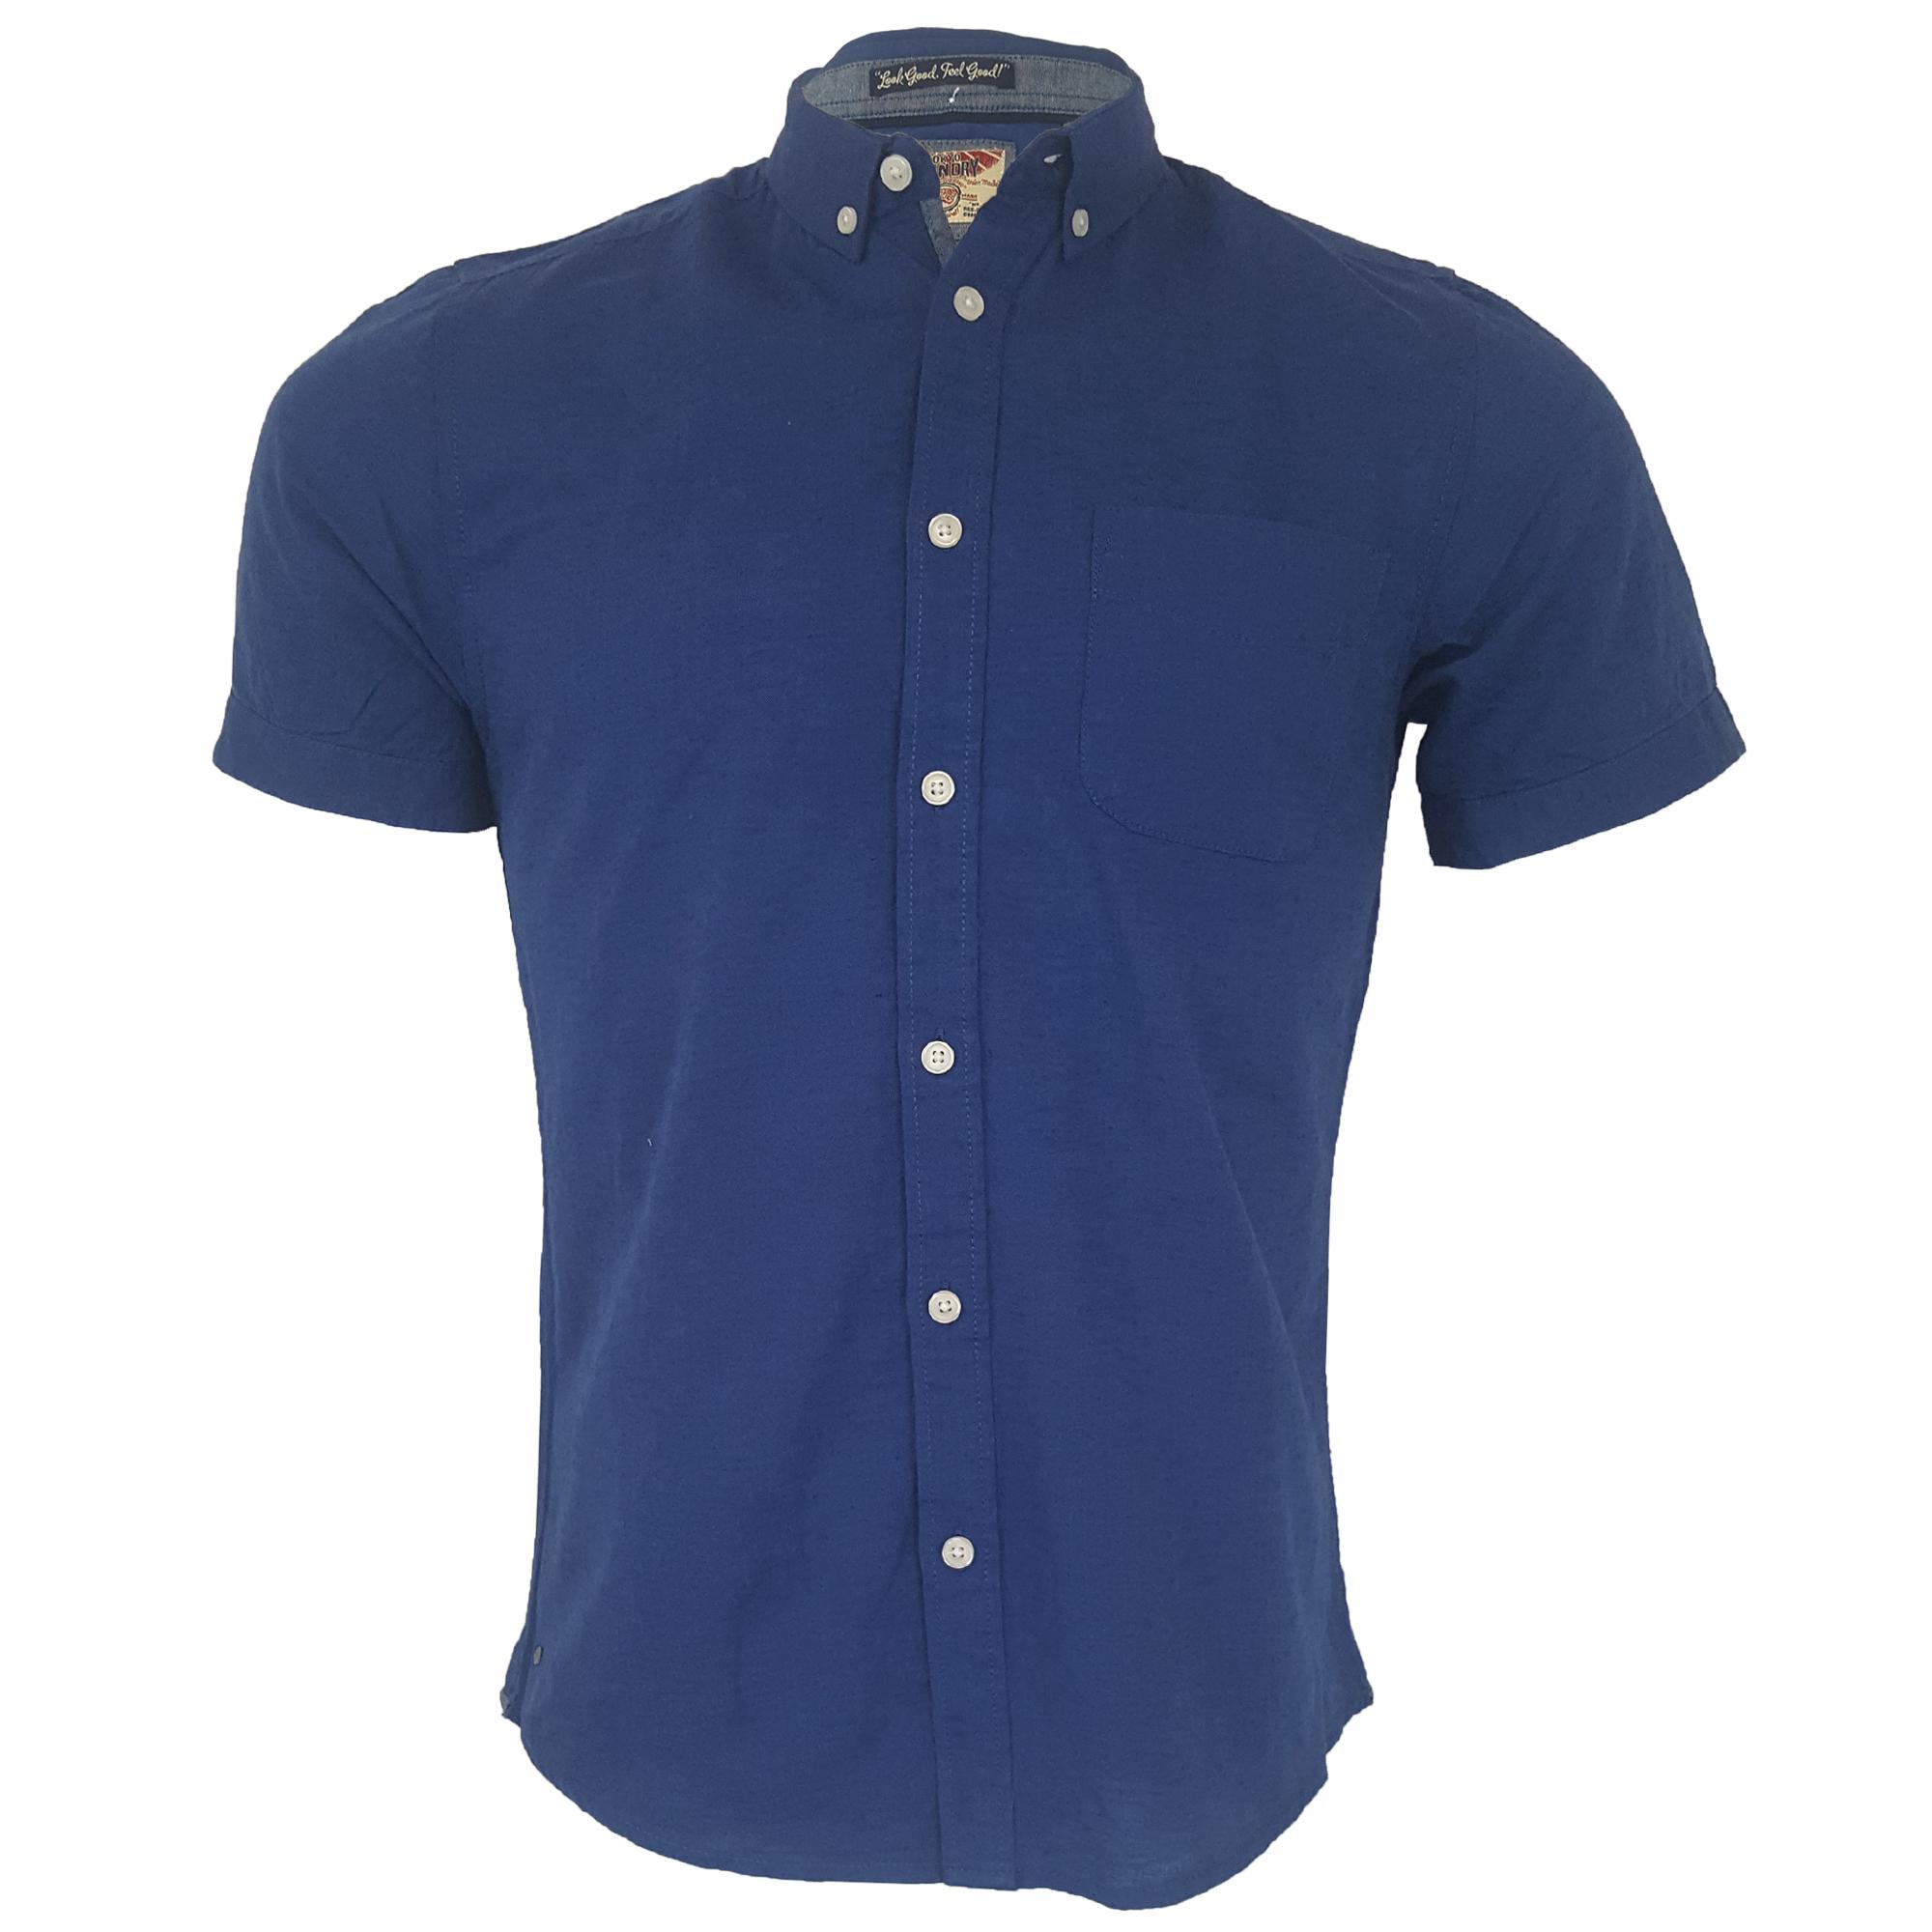 Mens-Linen-Cotton-Shirt-Tokyo-Laundry-Wells-Short-Sleeved-Grosvenor-Summer-New thumbnail 2